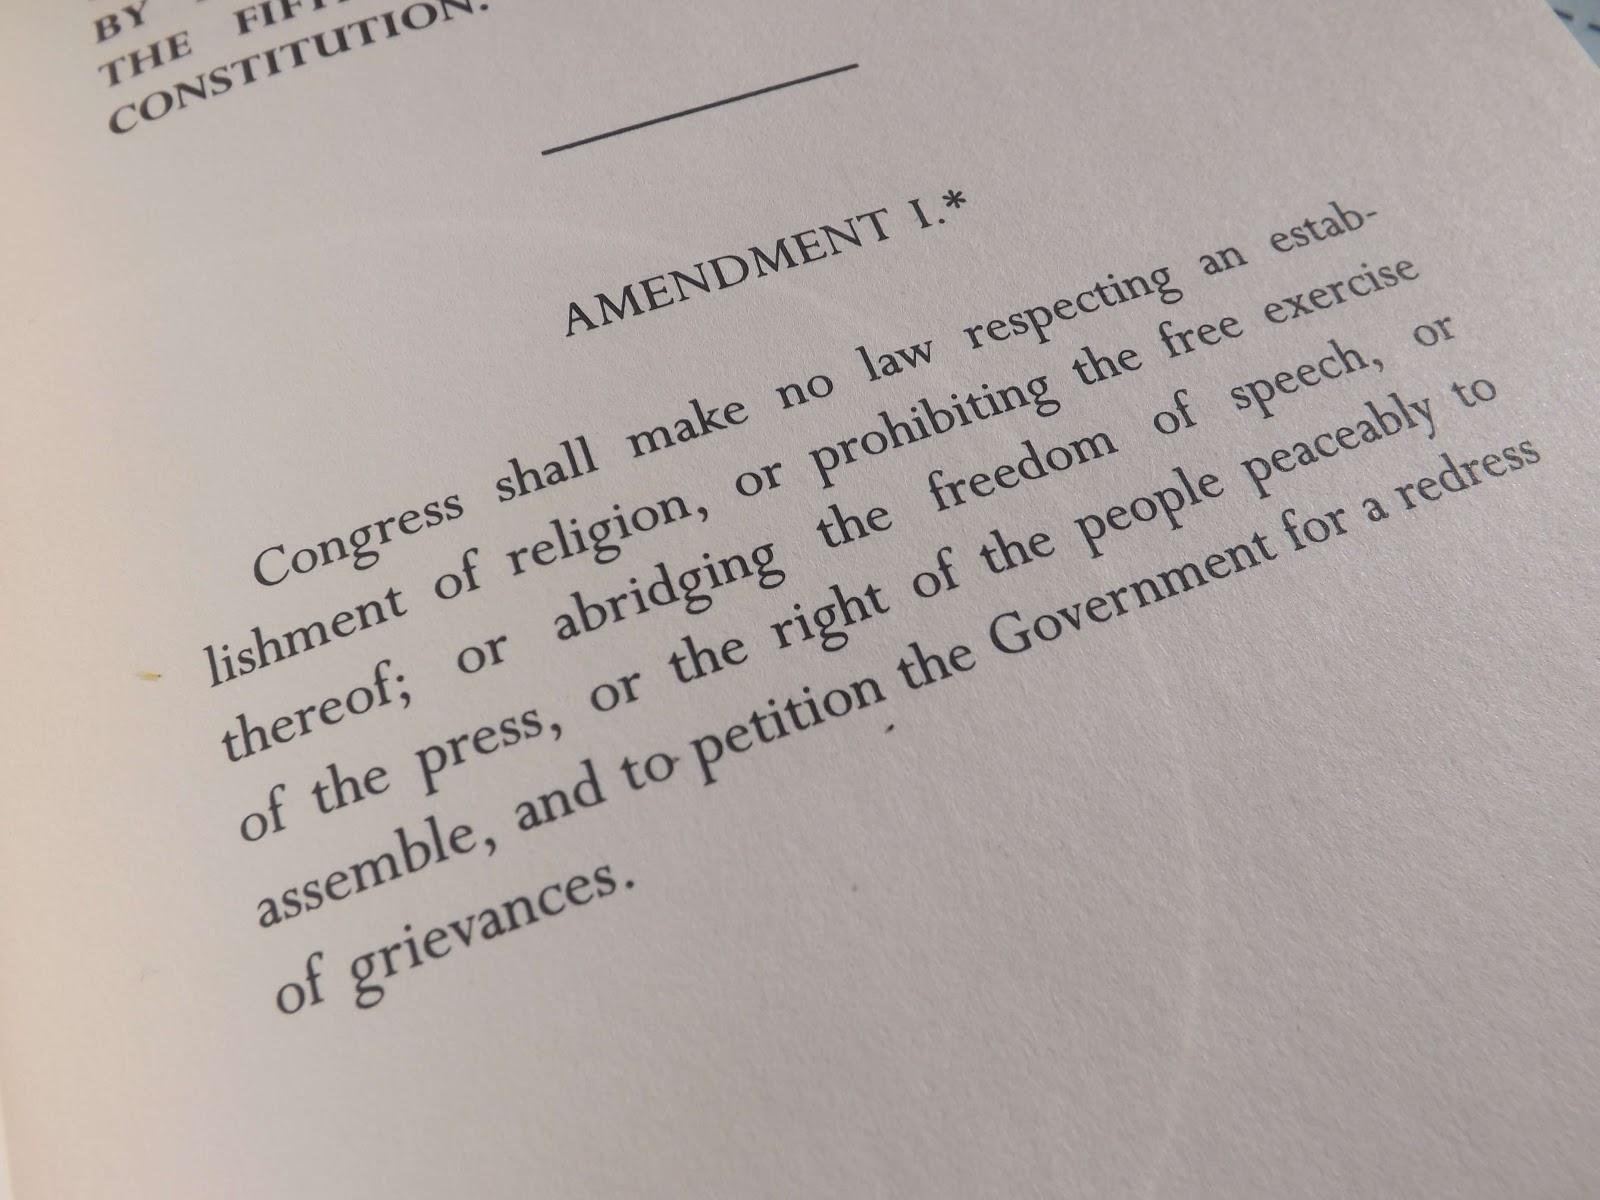 the thirteenth amendment Thirteenth amendment - slavery and involuntary servitudeamendment text | annotations section 1 neither slavery nor involuntary servitude, except as a punishment.